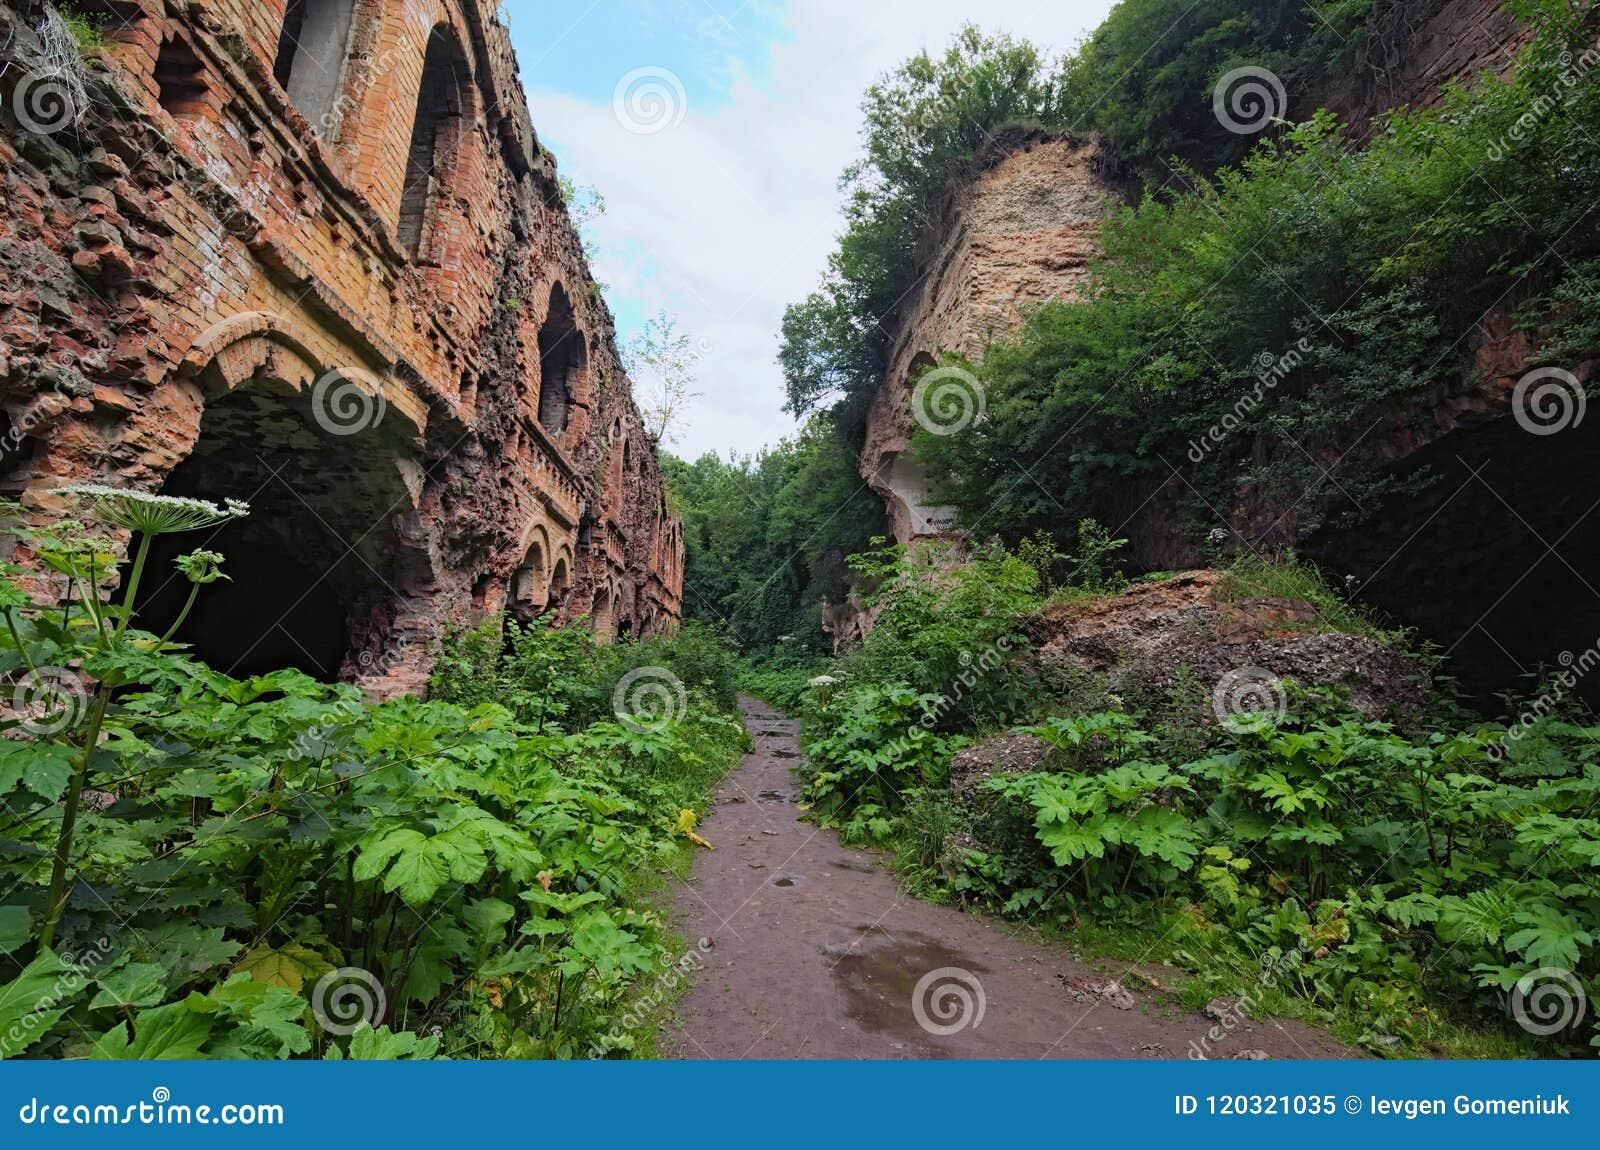 Ruins of Tarakanivskiy Fort- fortification, architectural monument of 19th century. Tarakaniv, Rivne oblast, Ukraine